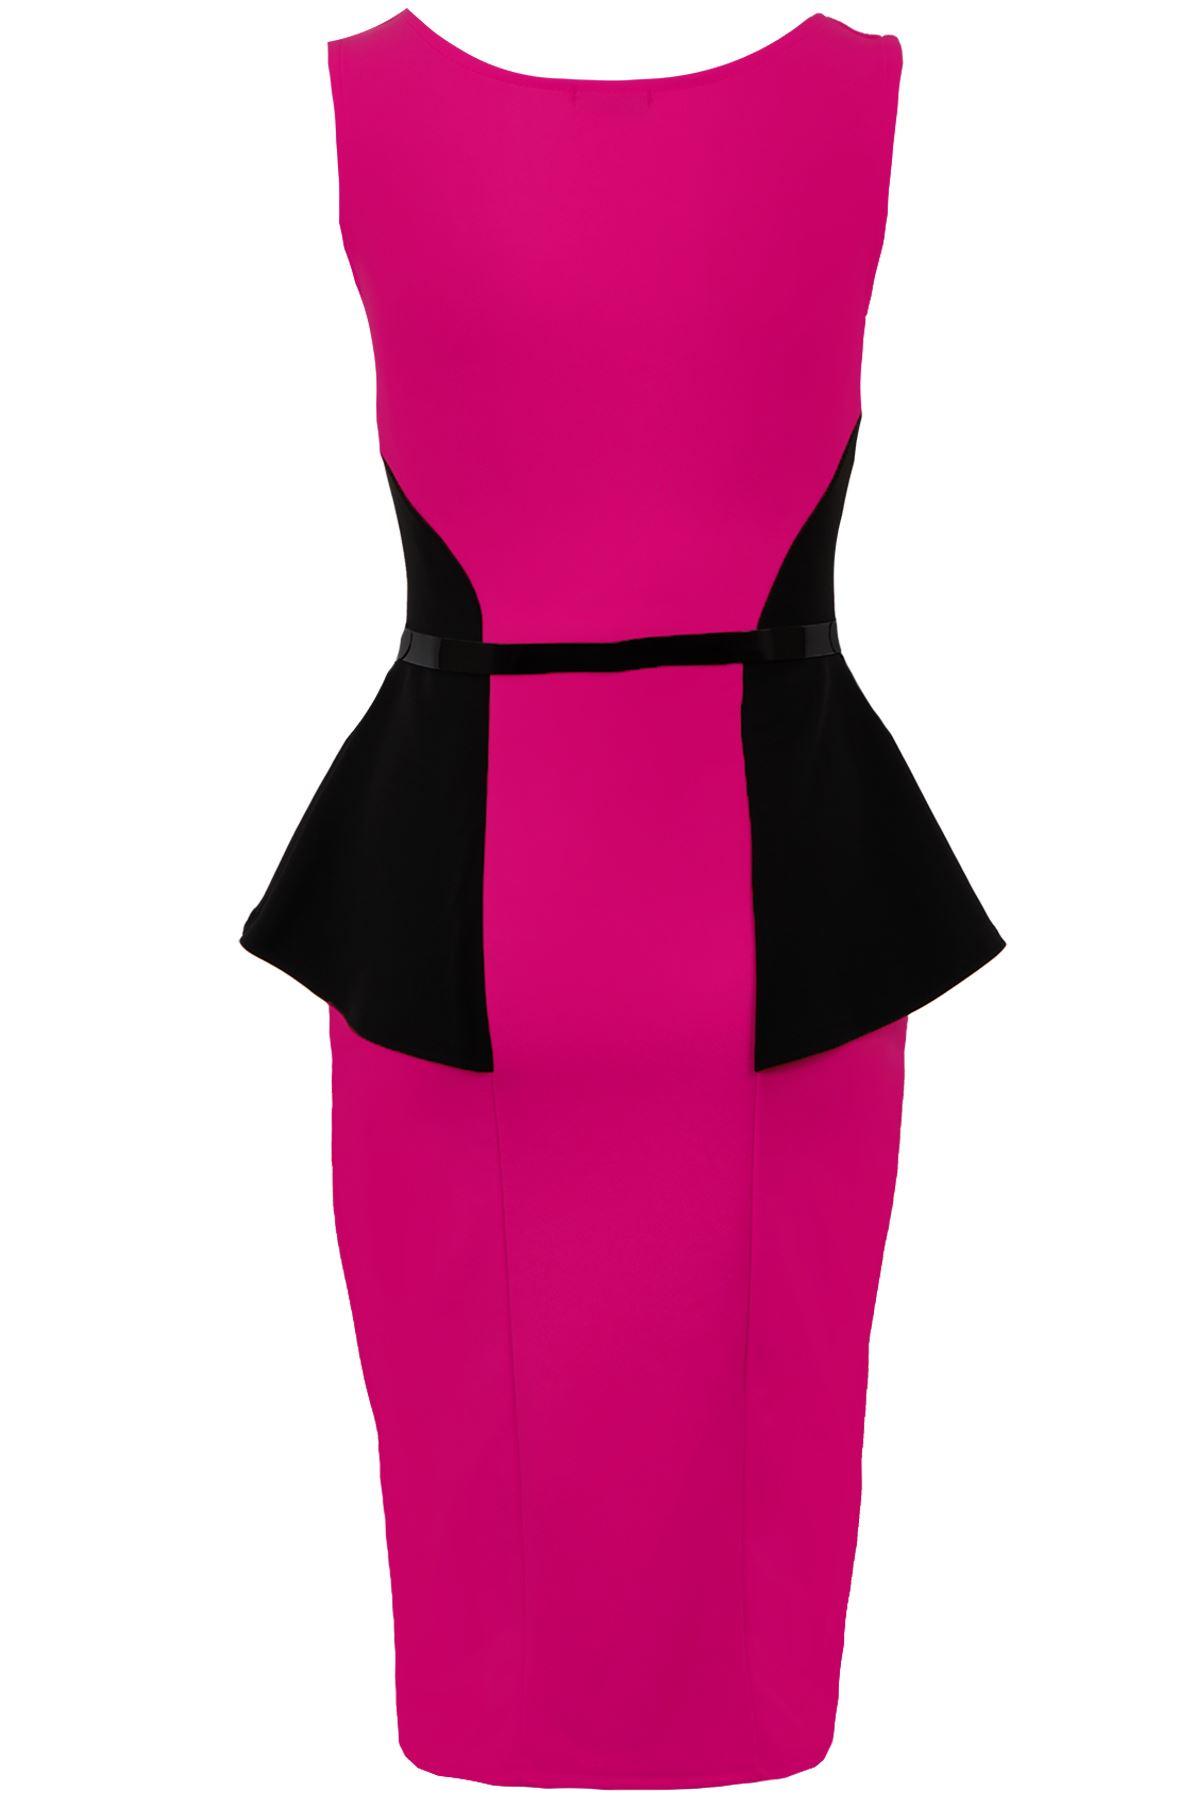 Ladies Sleeveless Belted Lace Contrast Women's Wrap Peplum Bodycon Dress